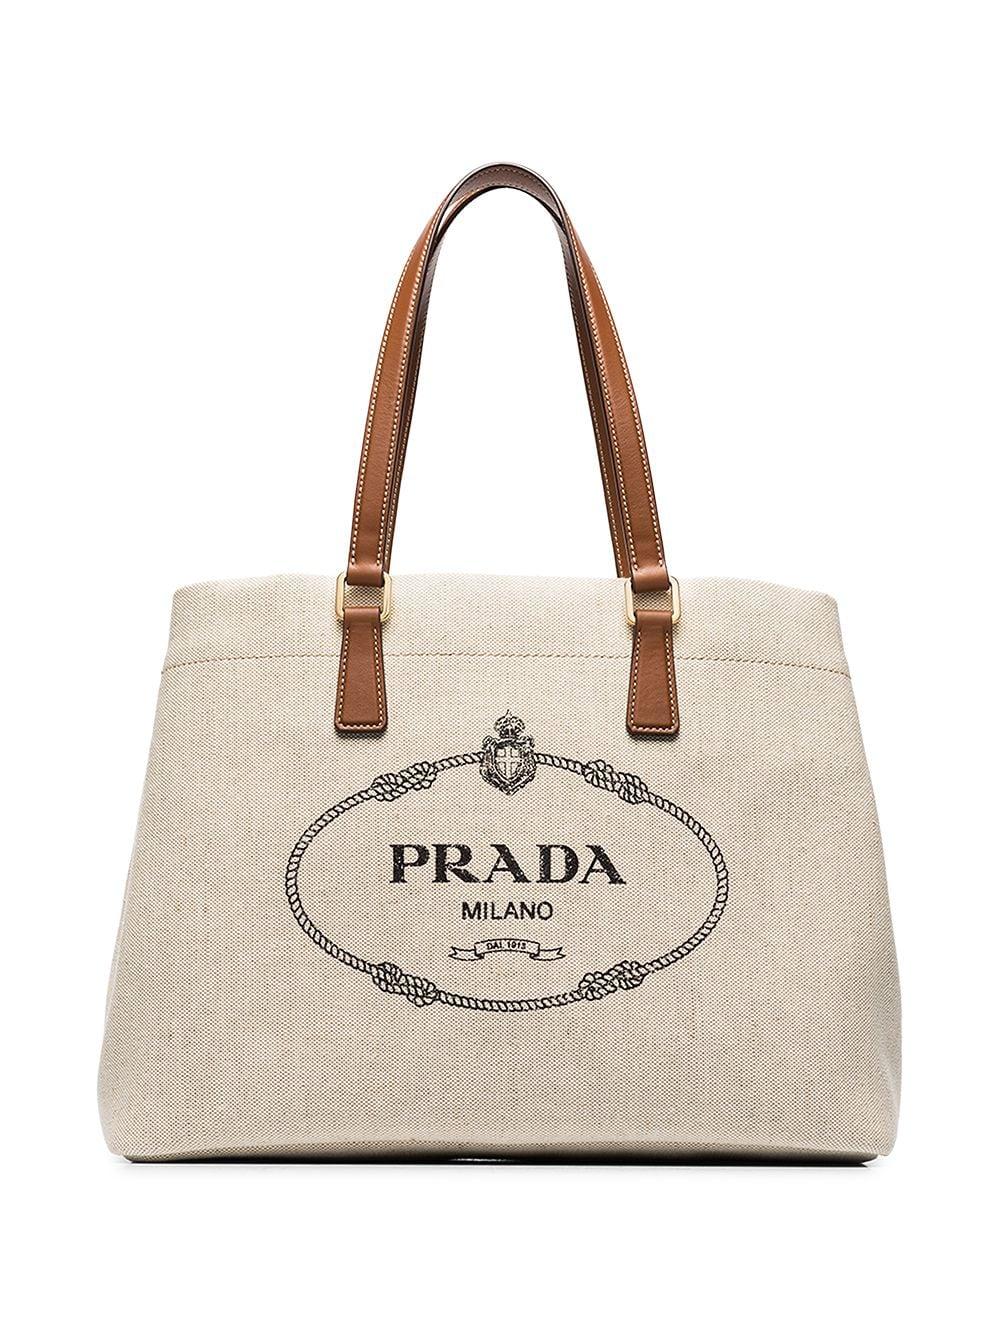 Prada Mistolino Canvas Tote in white for best designer tote bags for travel